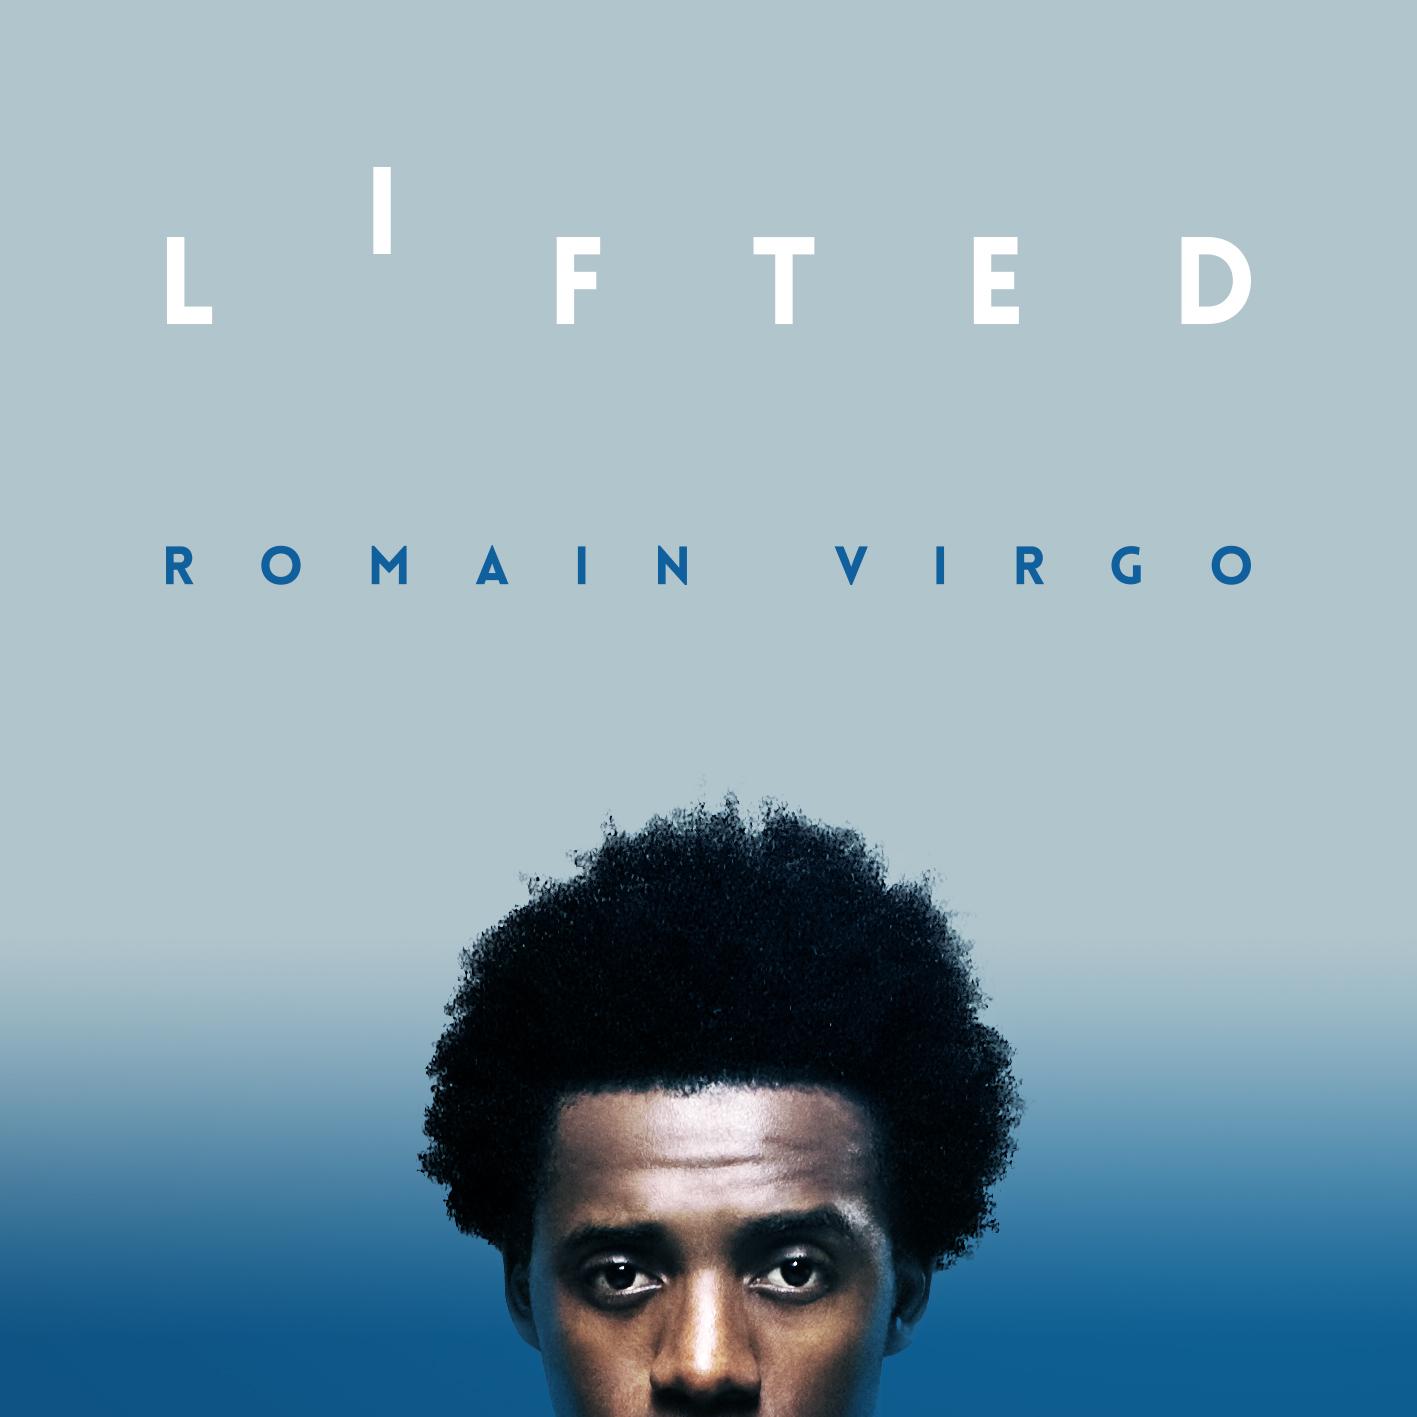 romain-virgo-lifted